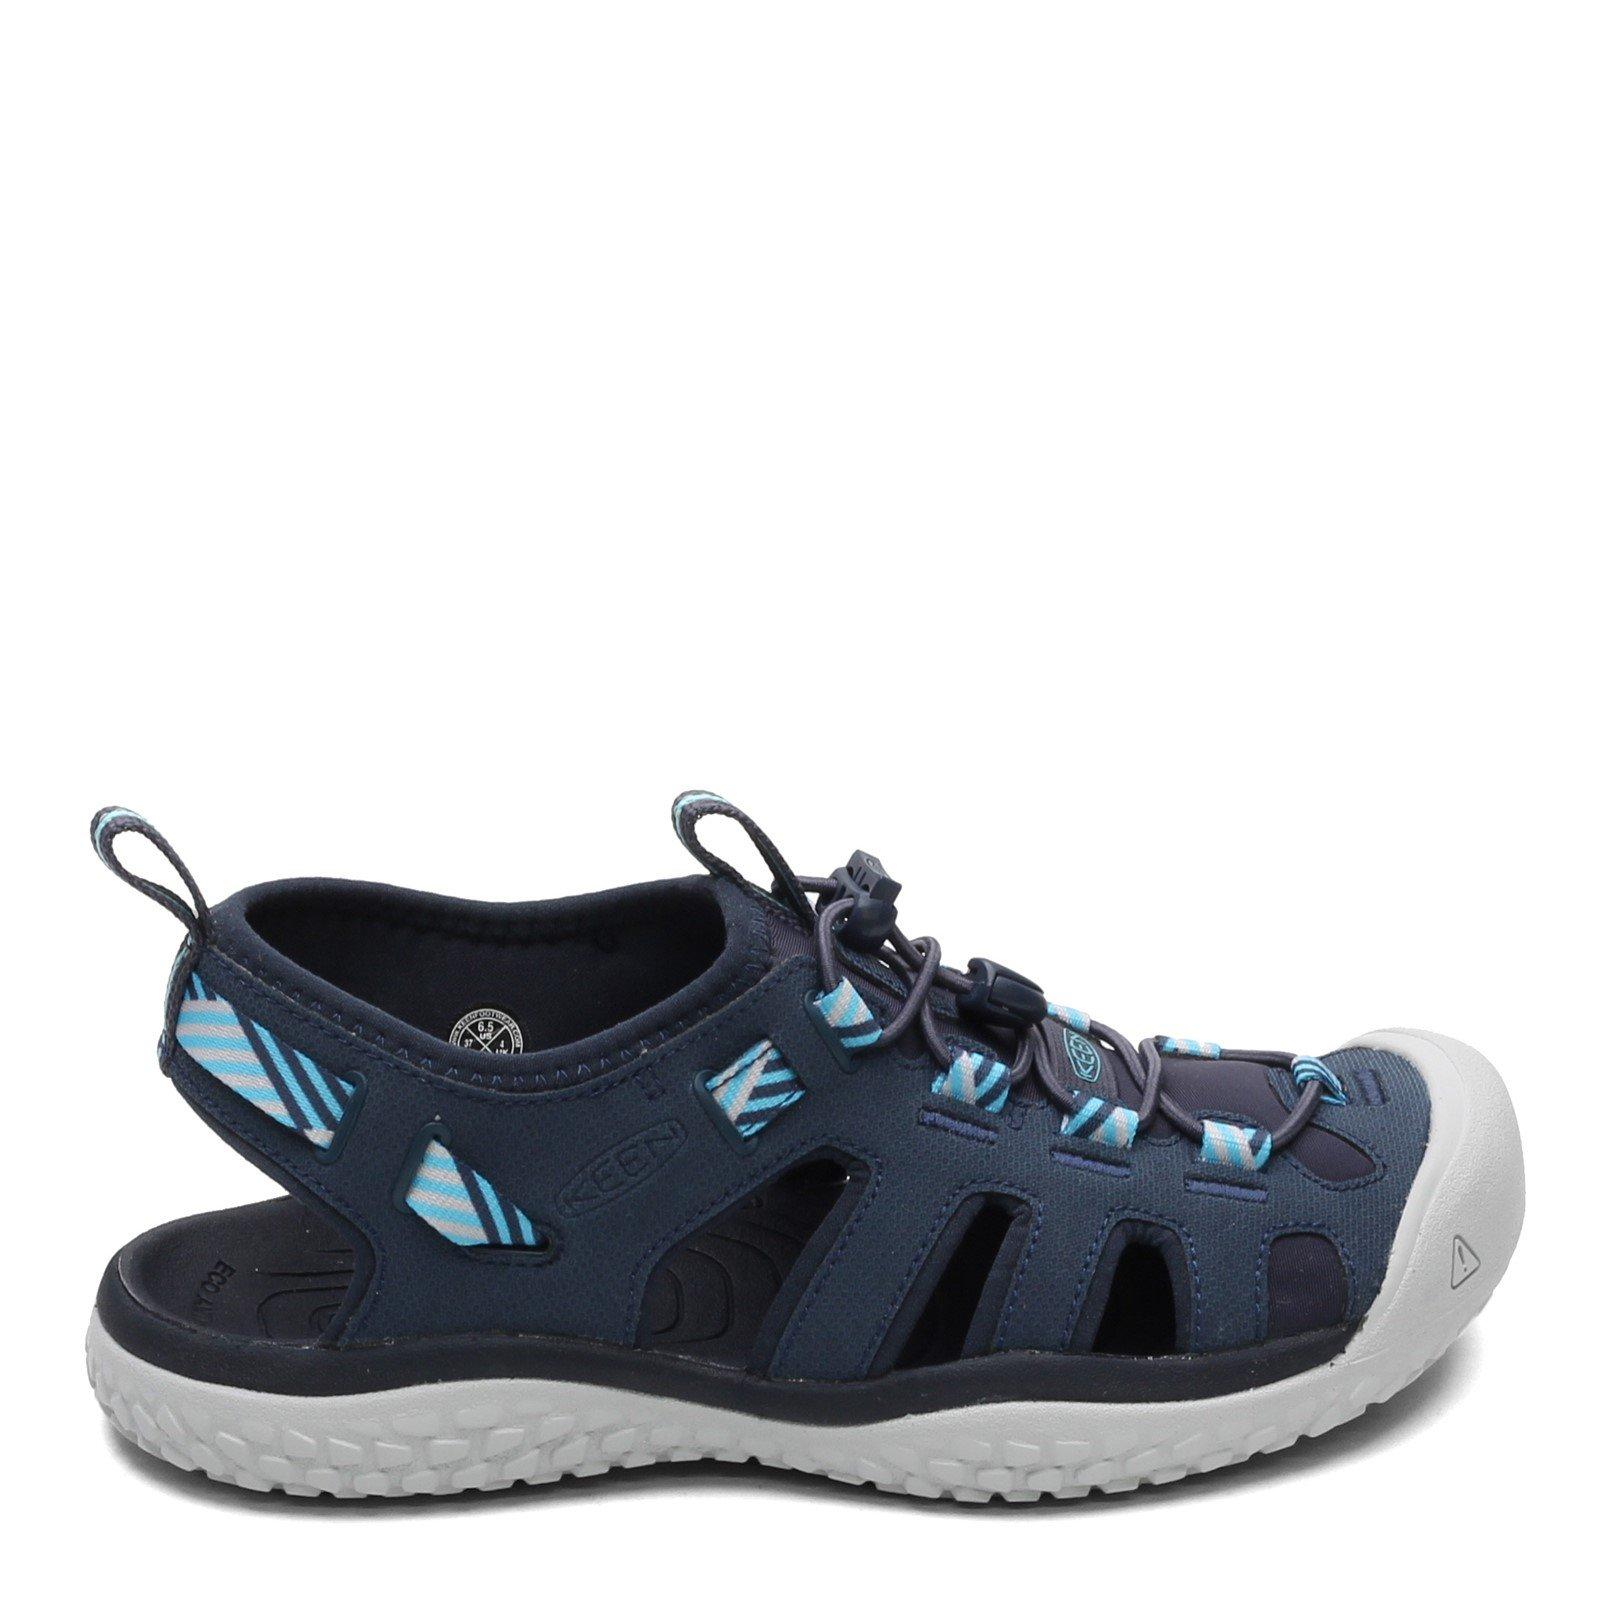 Women's Keen Solr Sandal Navy/Blue Mist